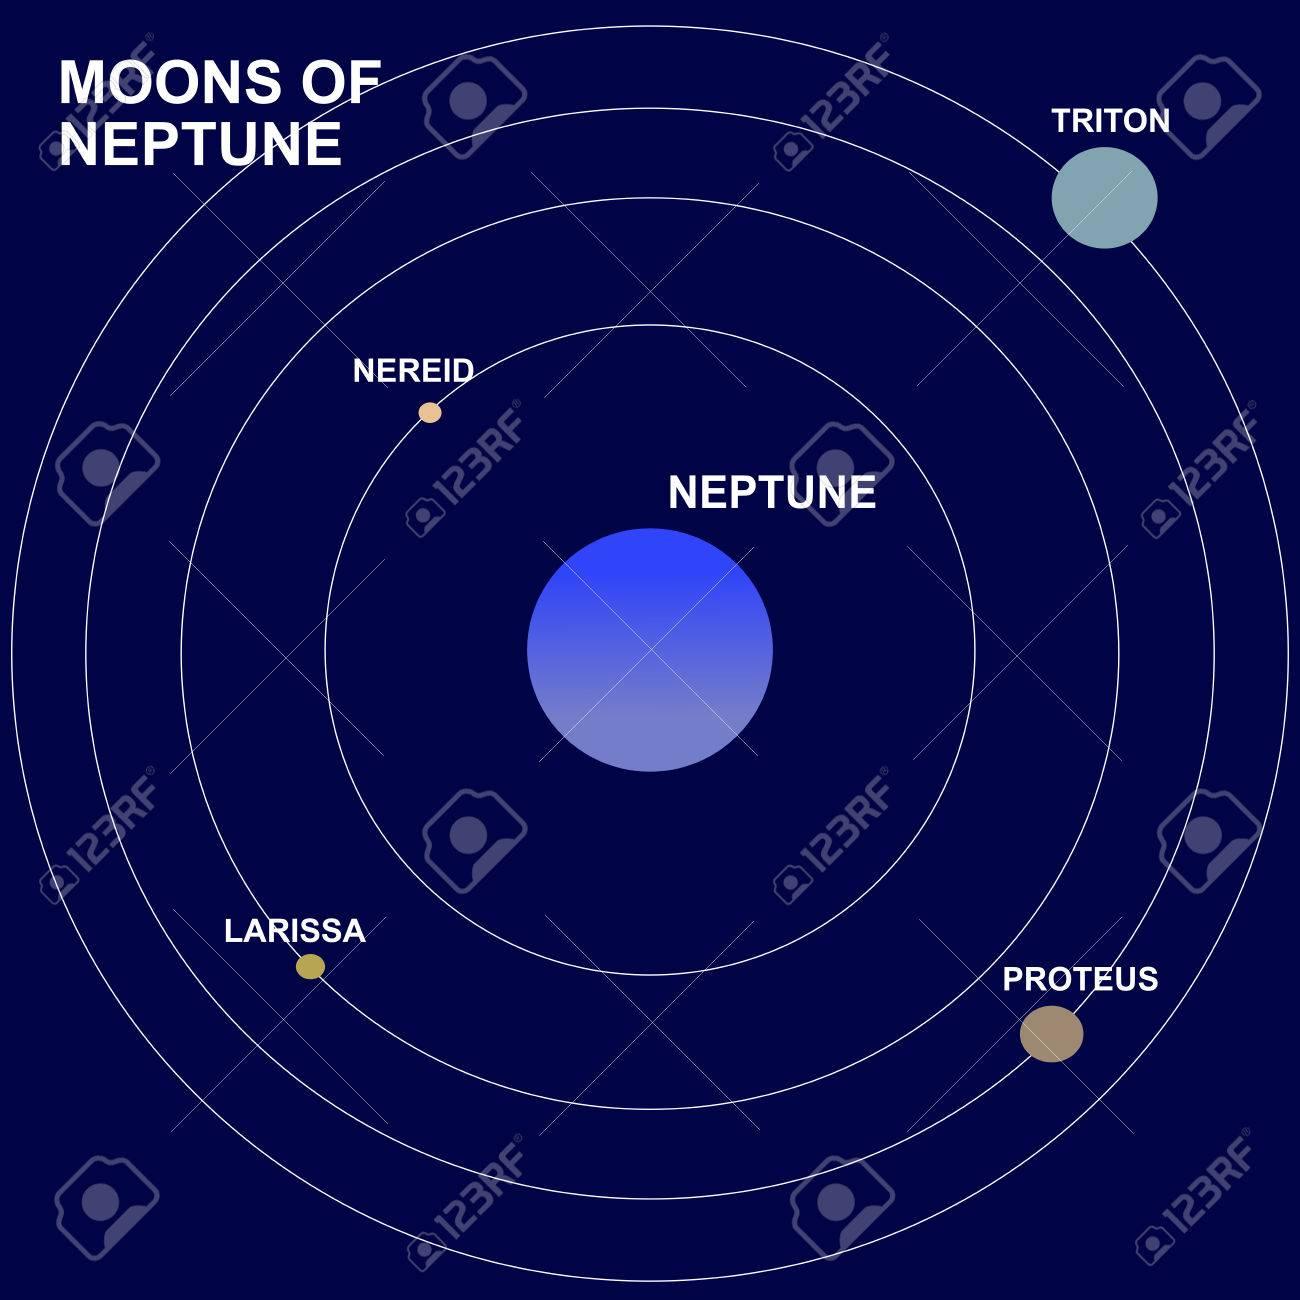 hight resolution of moons or satellites of neptune planet triton proteus larissa and nereid stock